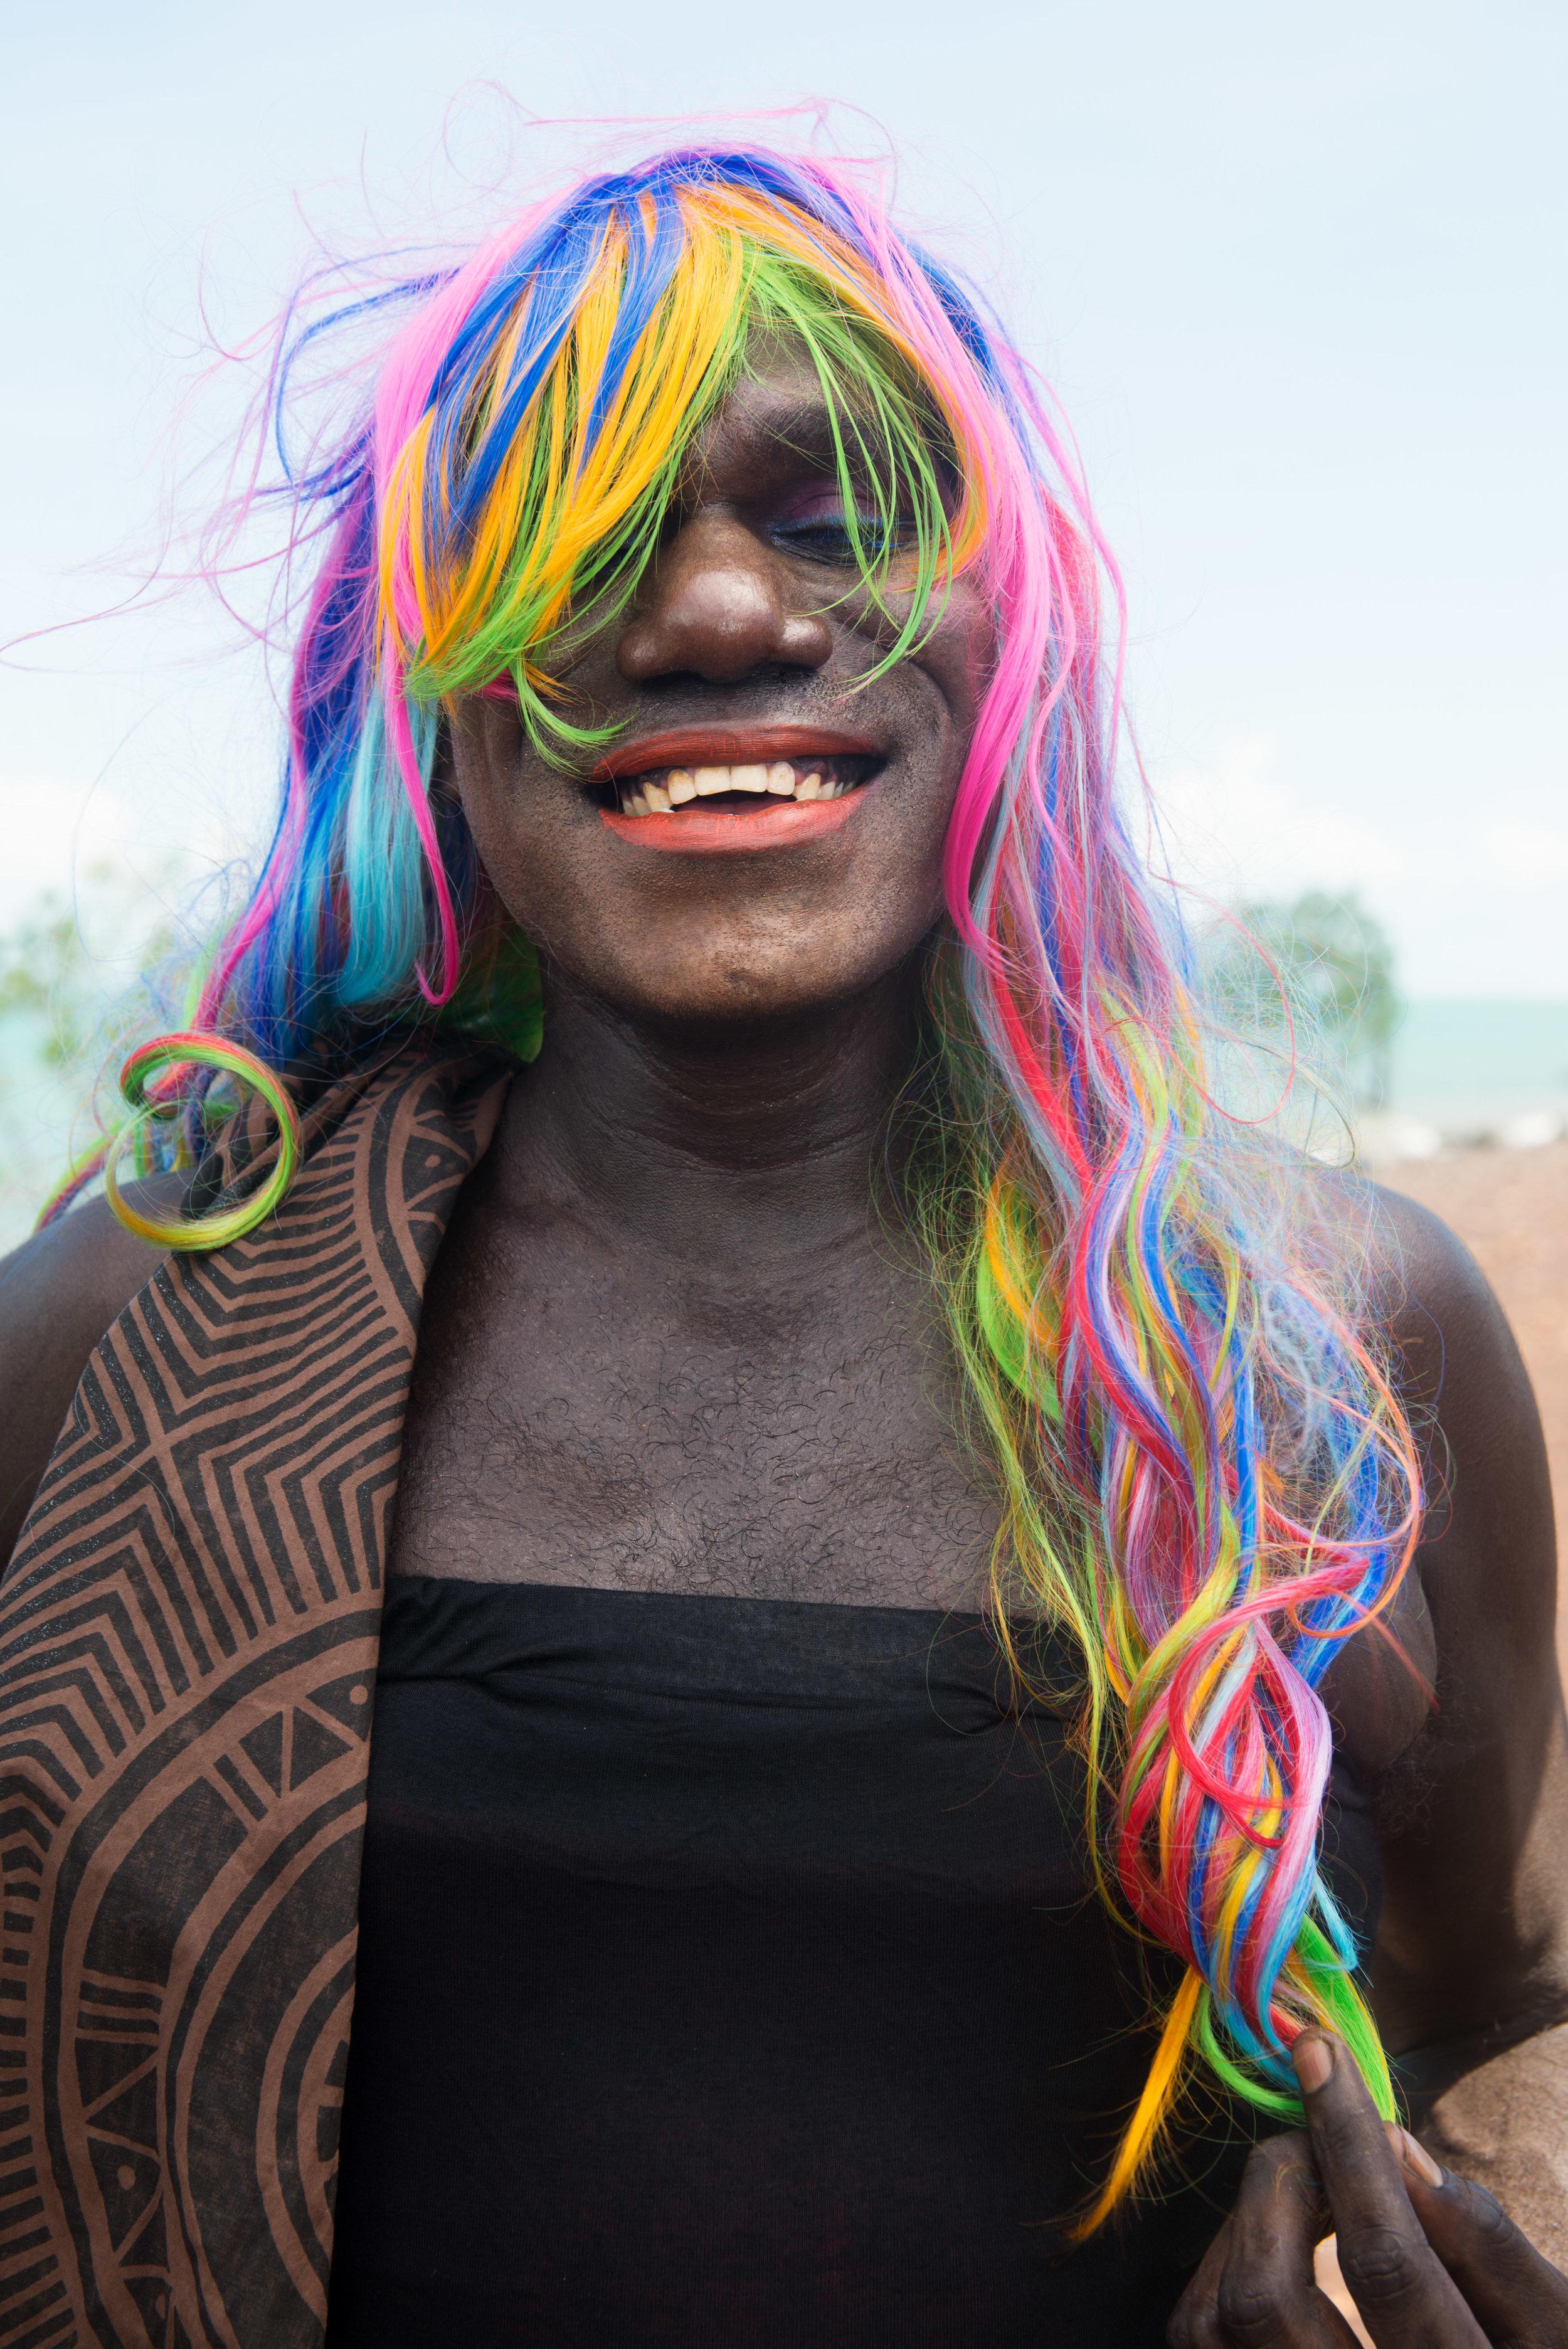 Tiwi Sista Girls @ Mardi Gras 2017 //Jayma